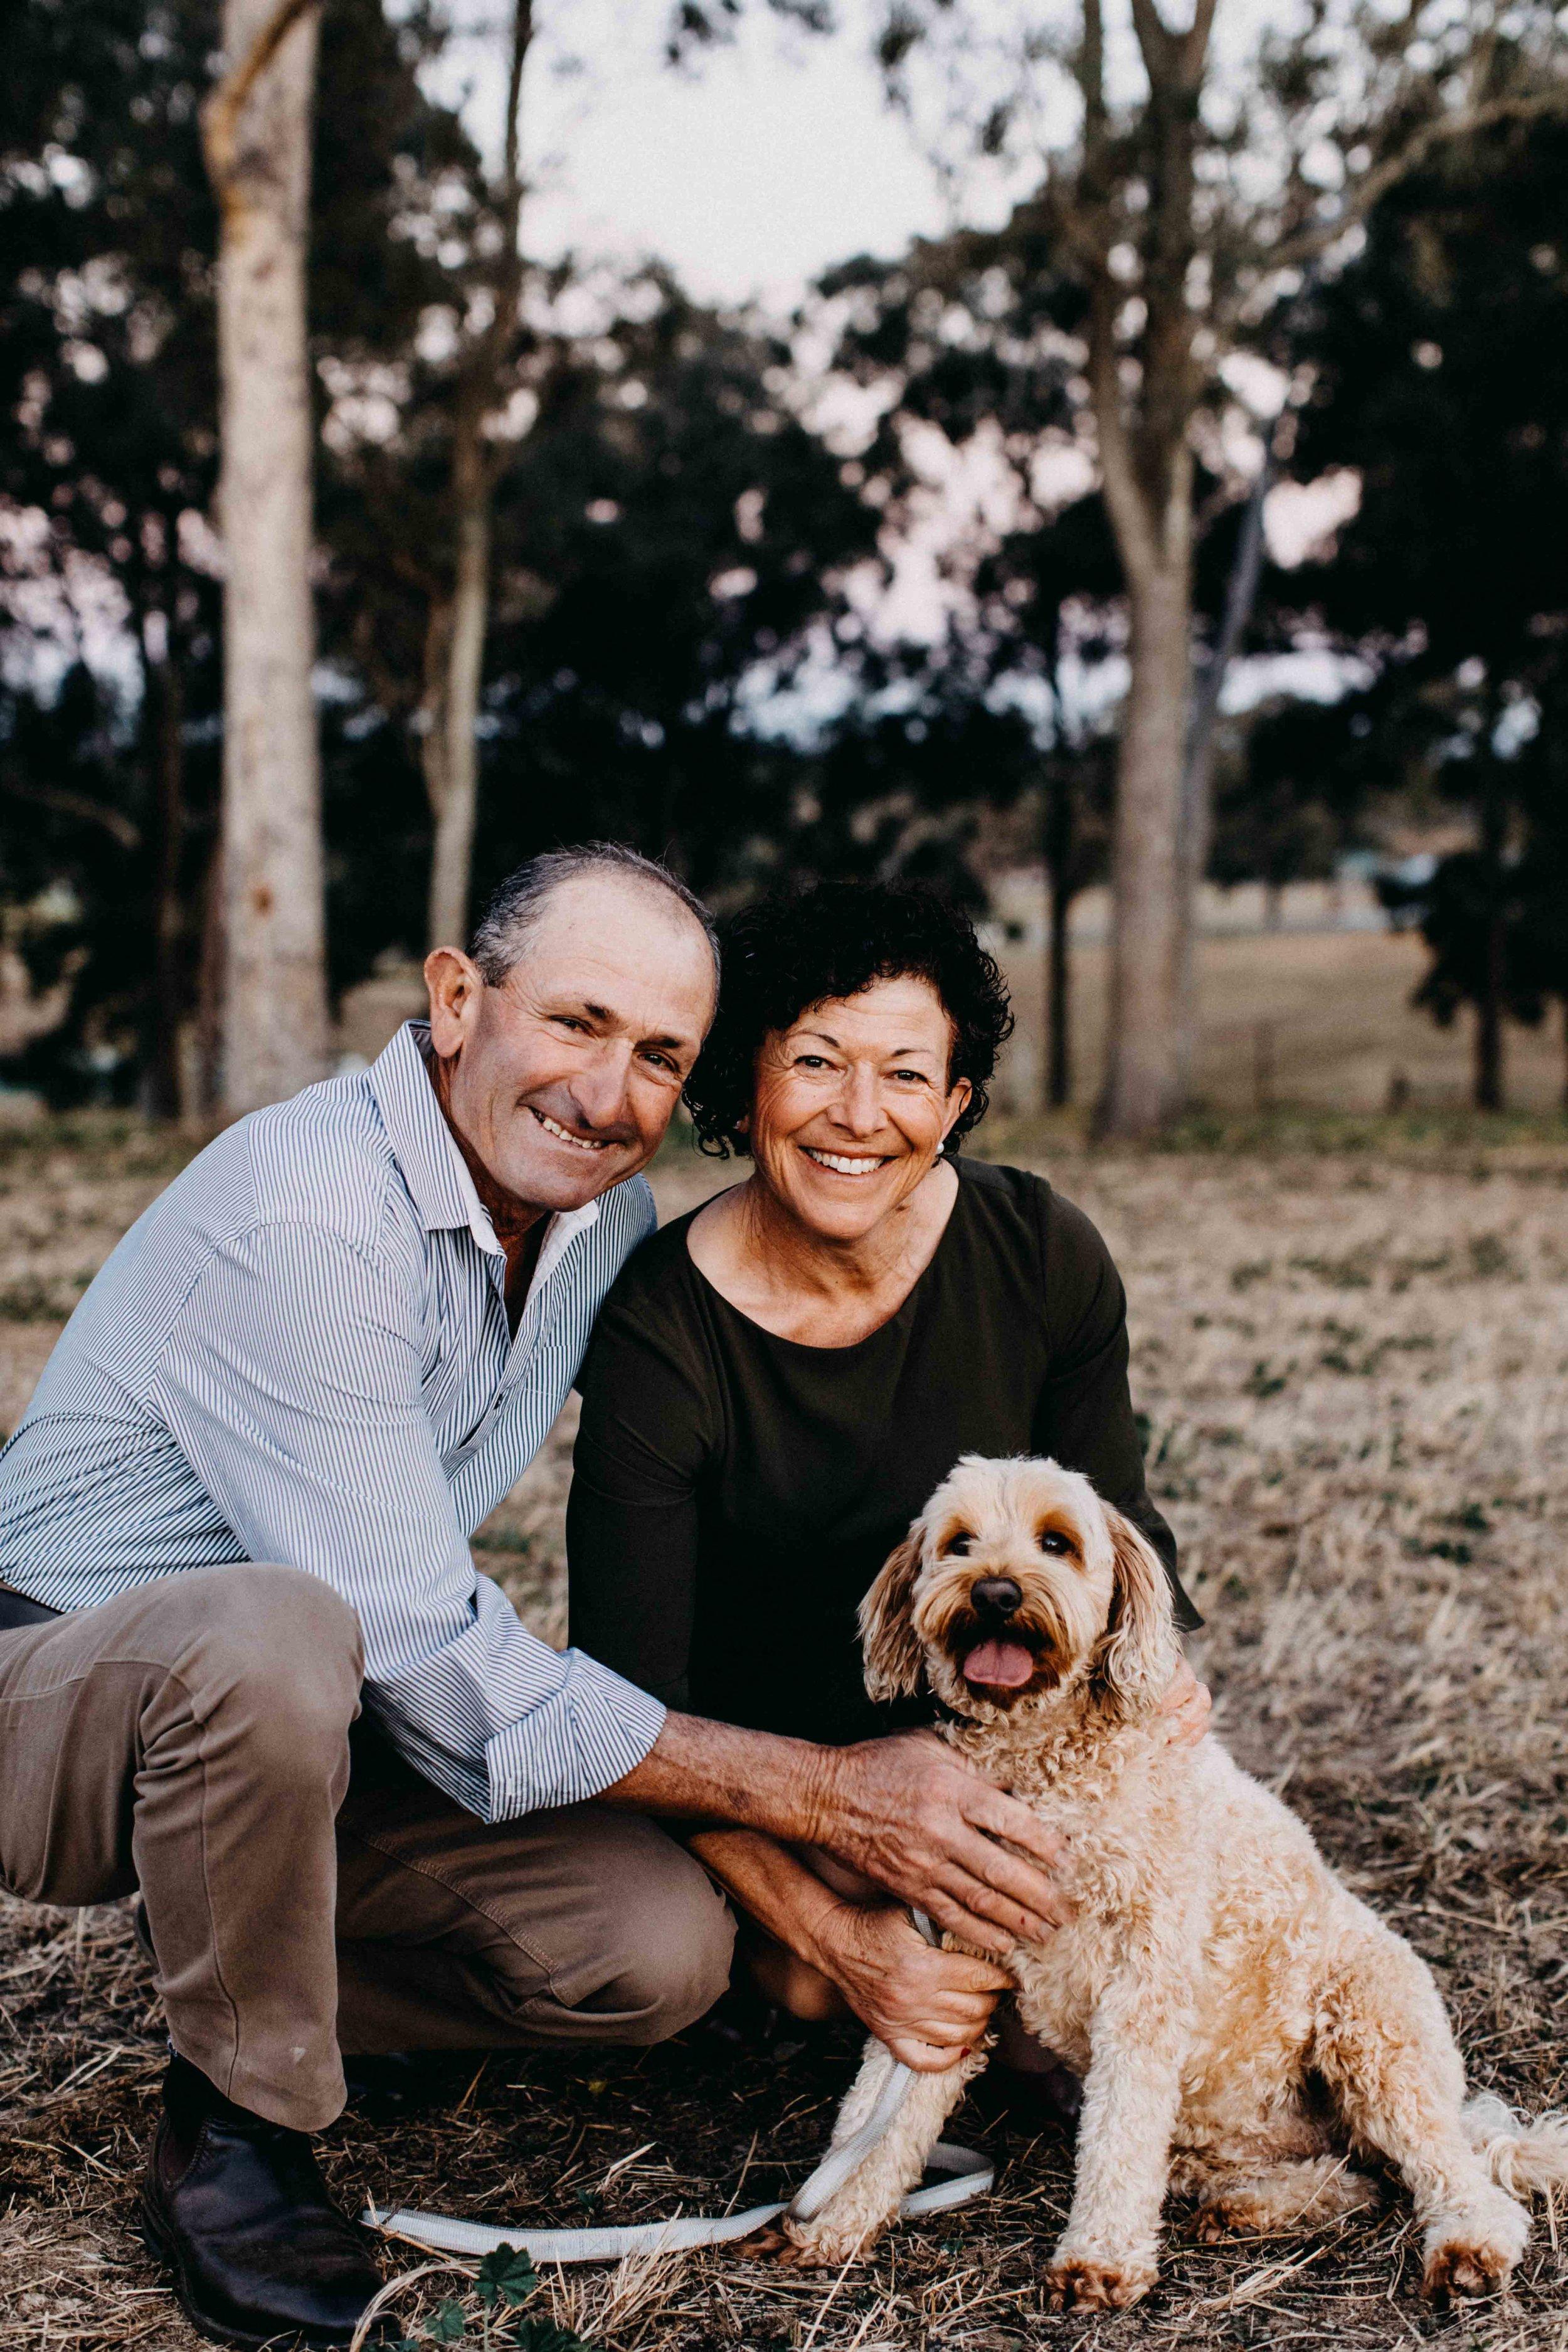 camden-family-photography-galea-www.emilyobrienphotography.net-49.jpg